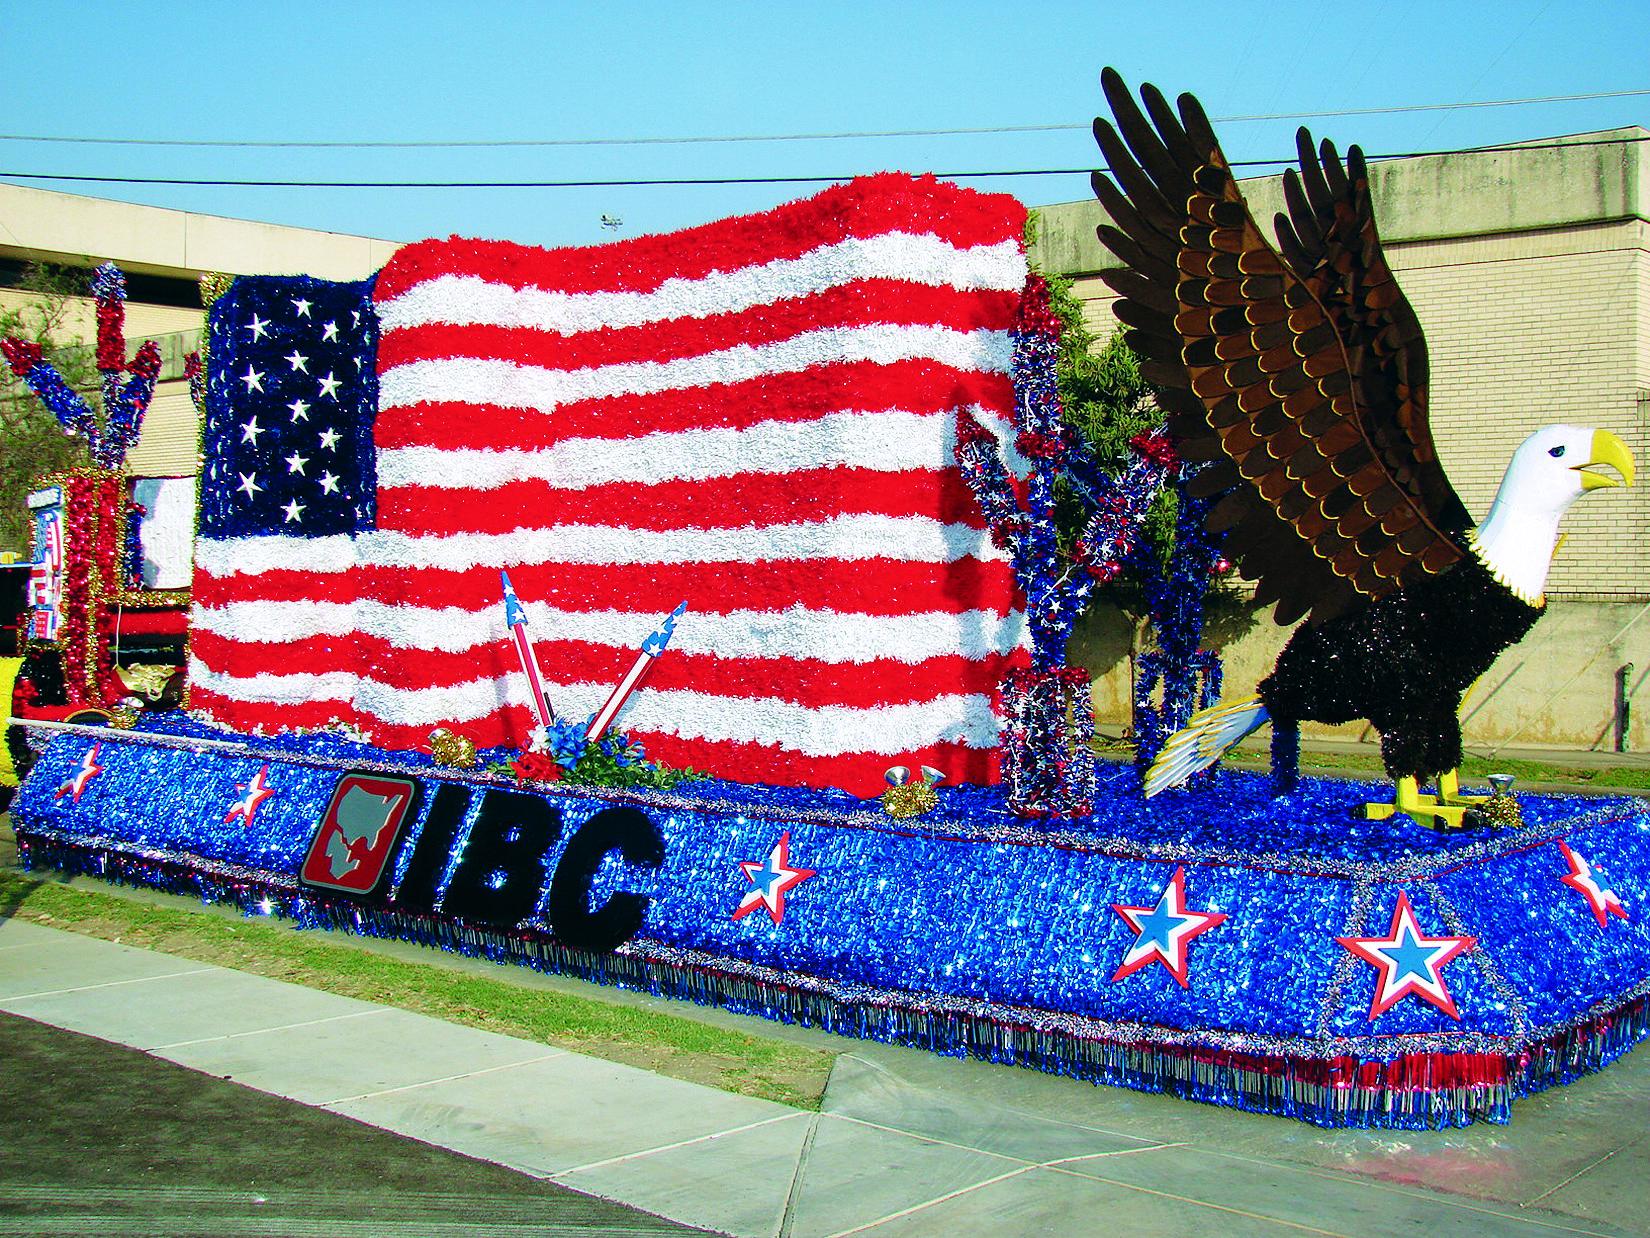 Flag Eagle Parade Float Create Unique 4th Of July Patriotic Parade